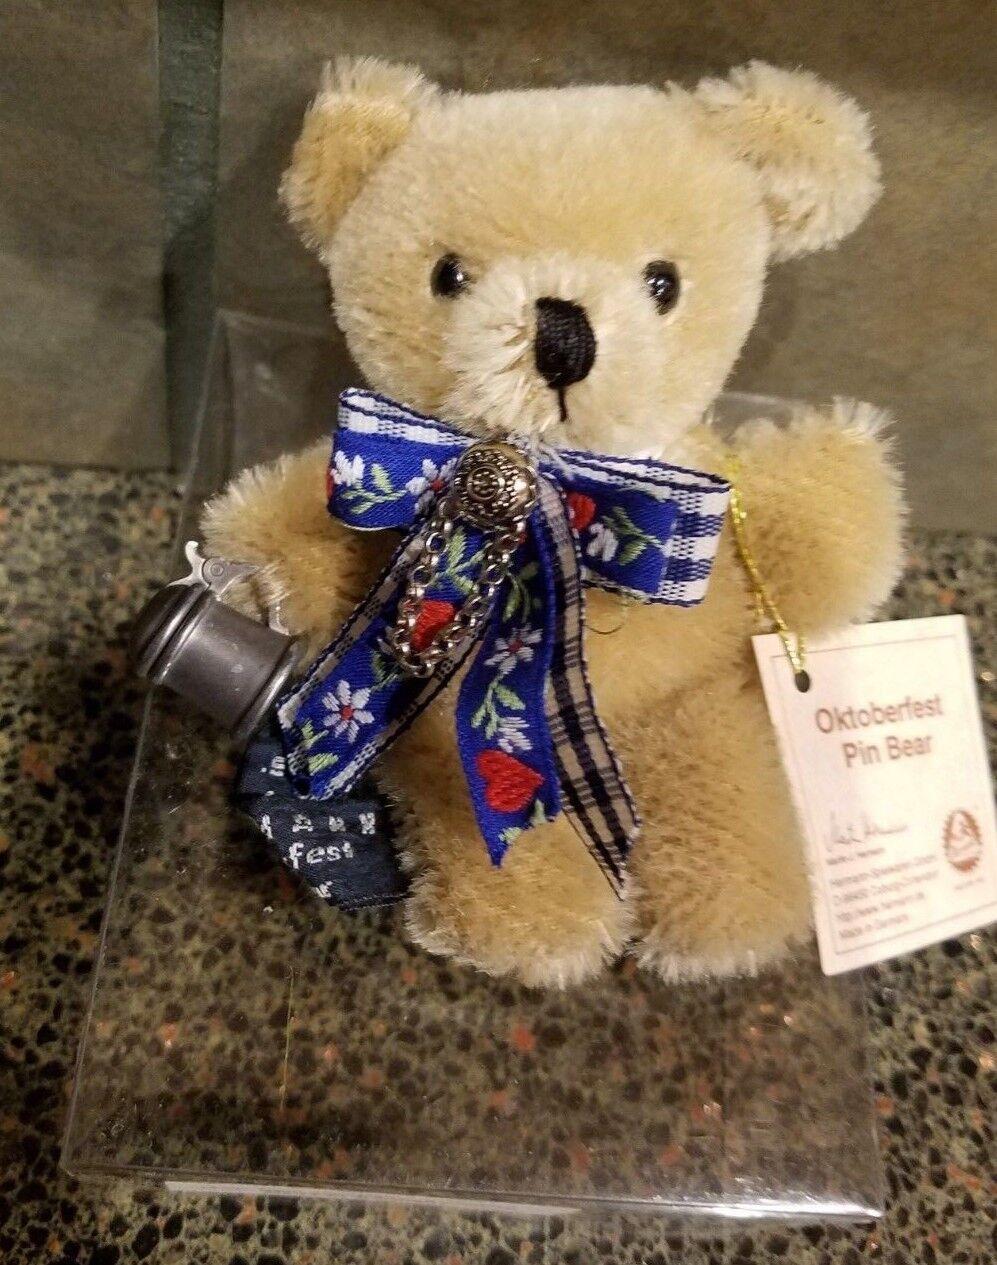 HERMANN SPIELWAREN  OKTOBERFEST BEAR  LIMITED EDITION PLUSH TEDDY BEAR